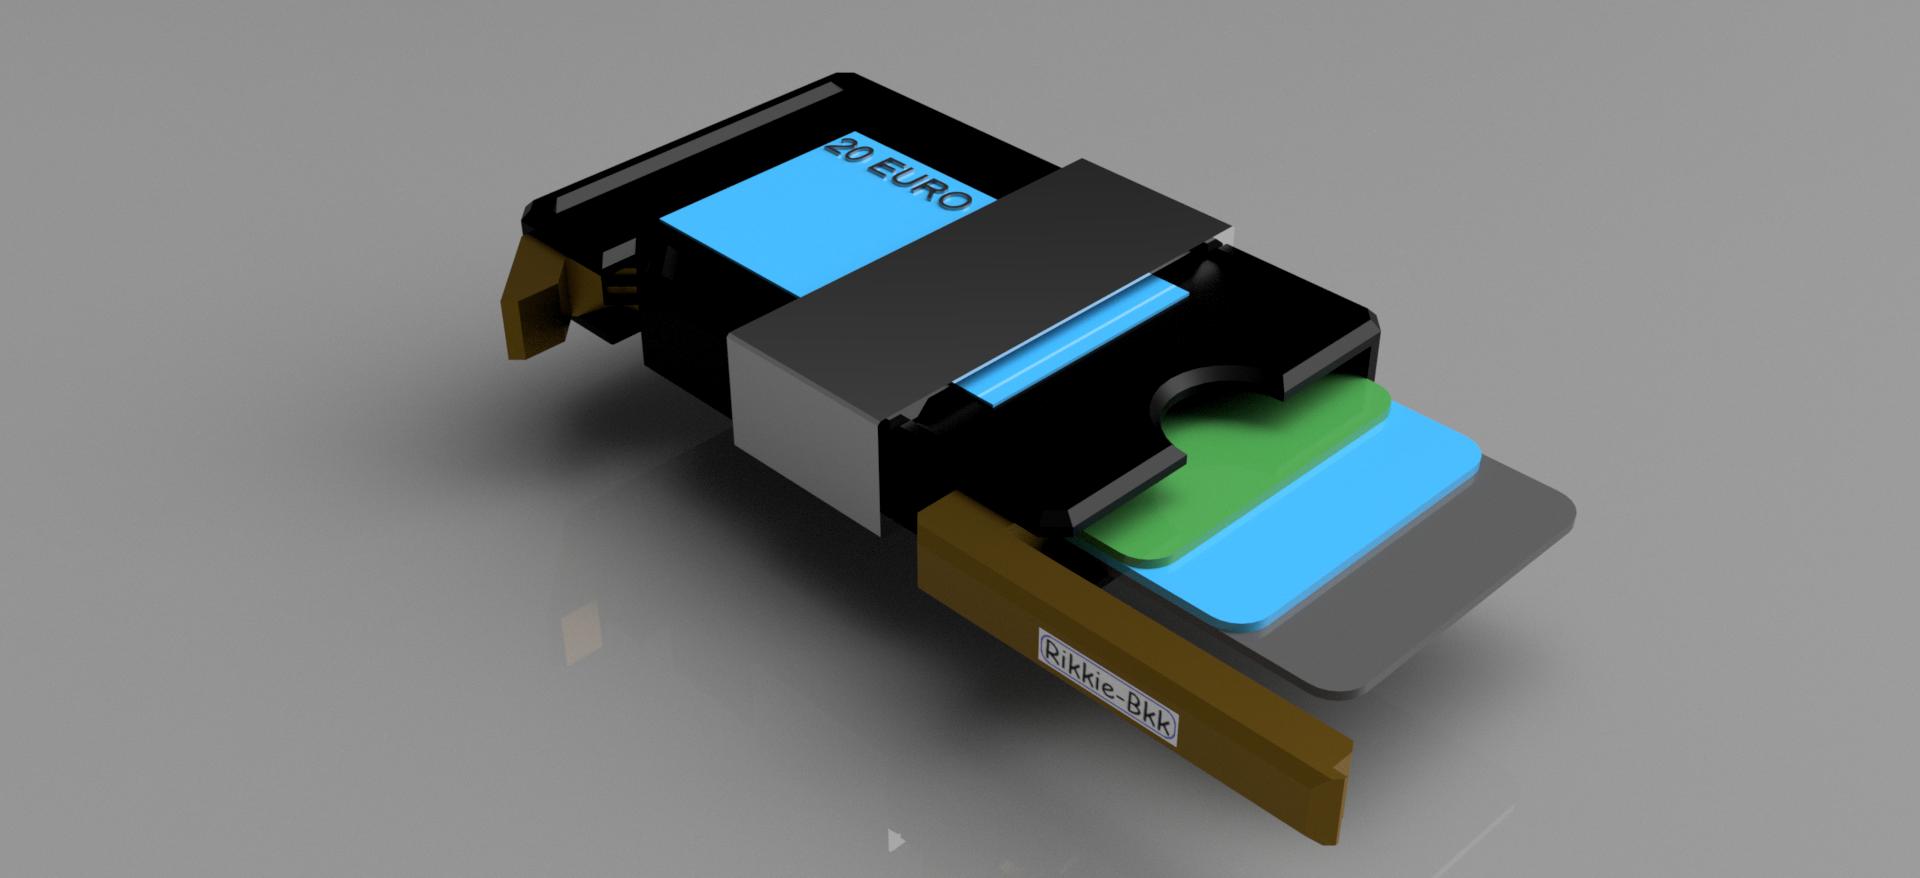 wallet 3.png Download STL file Slim Wallet with money clip • 3D print template, rikkieBKK